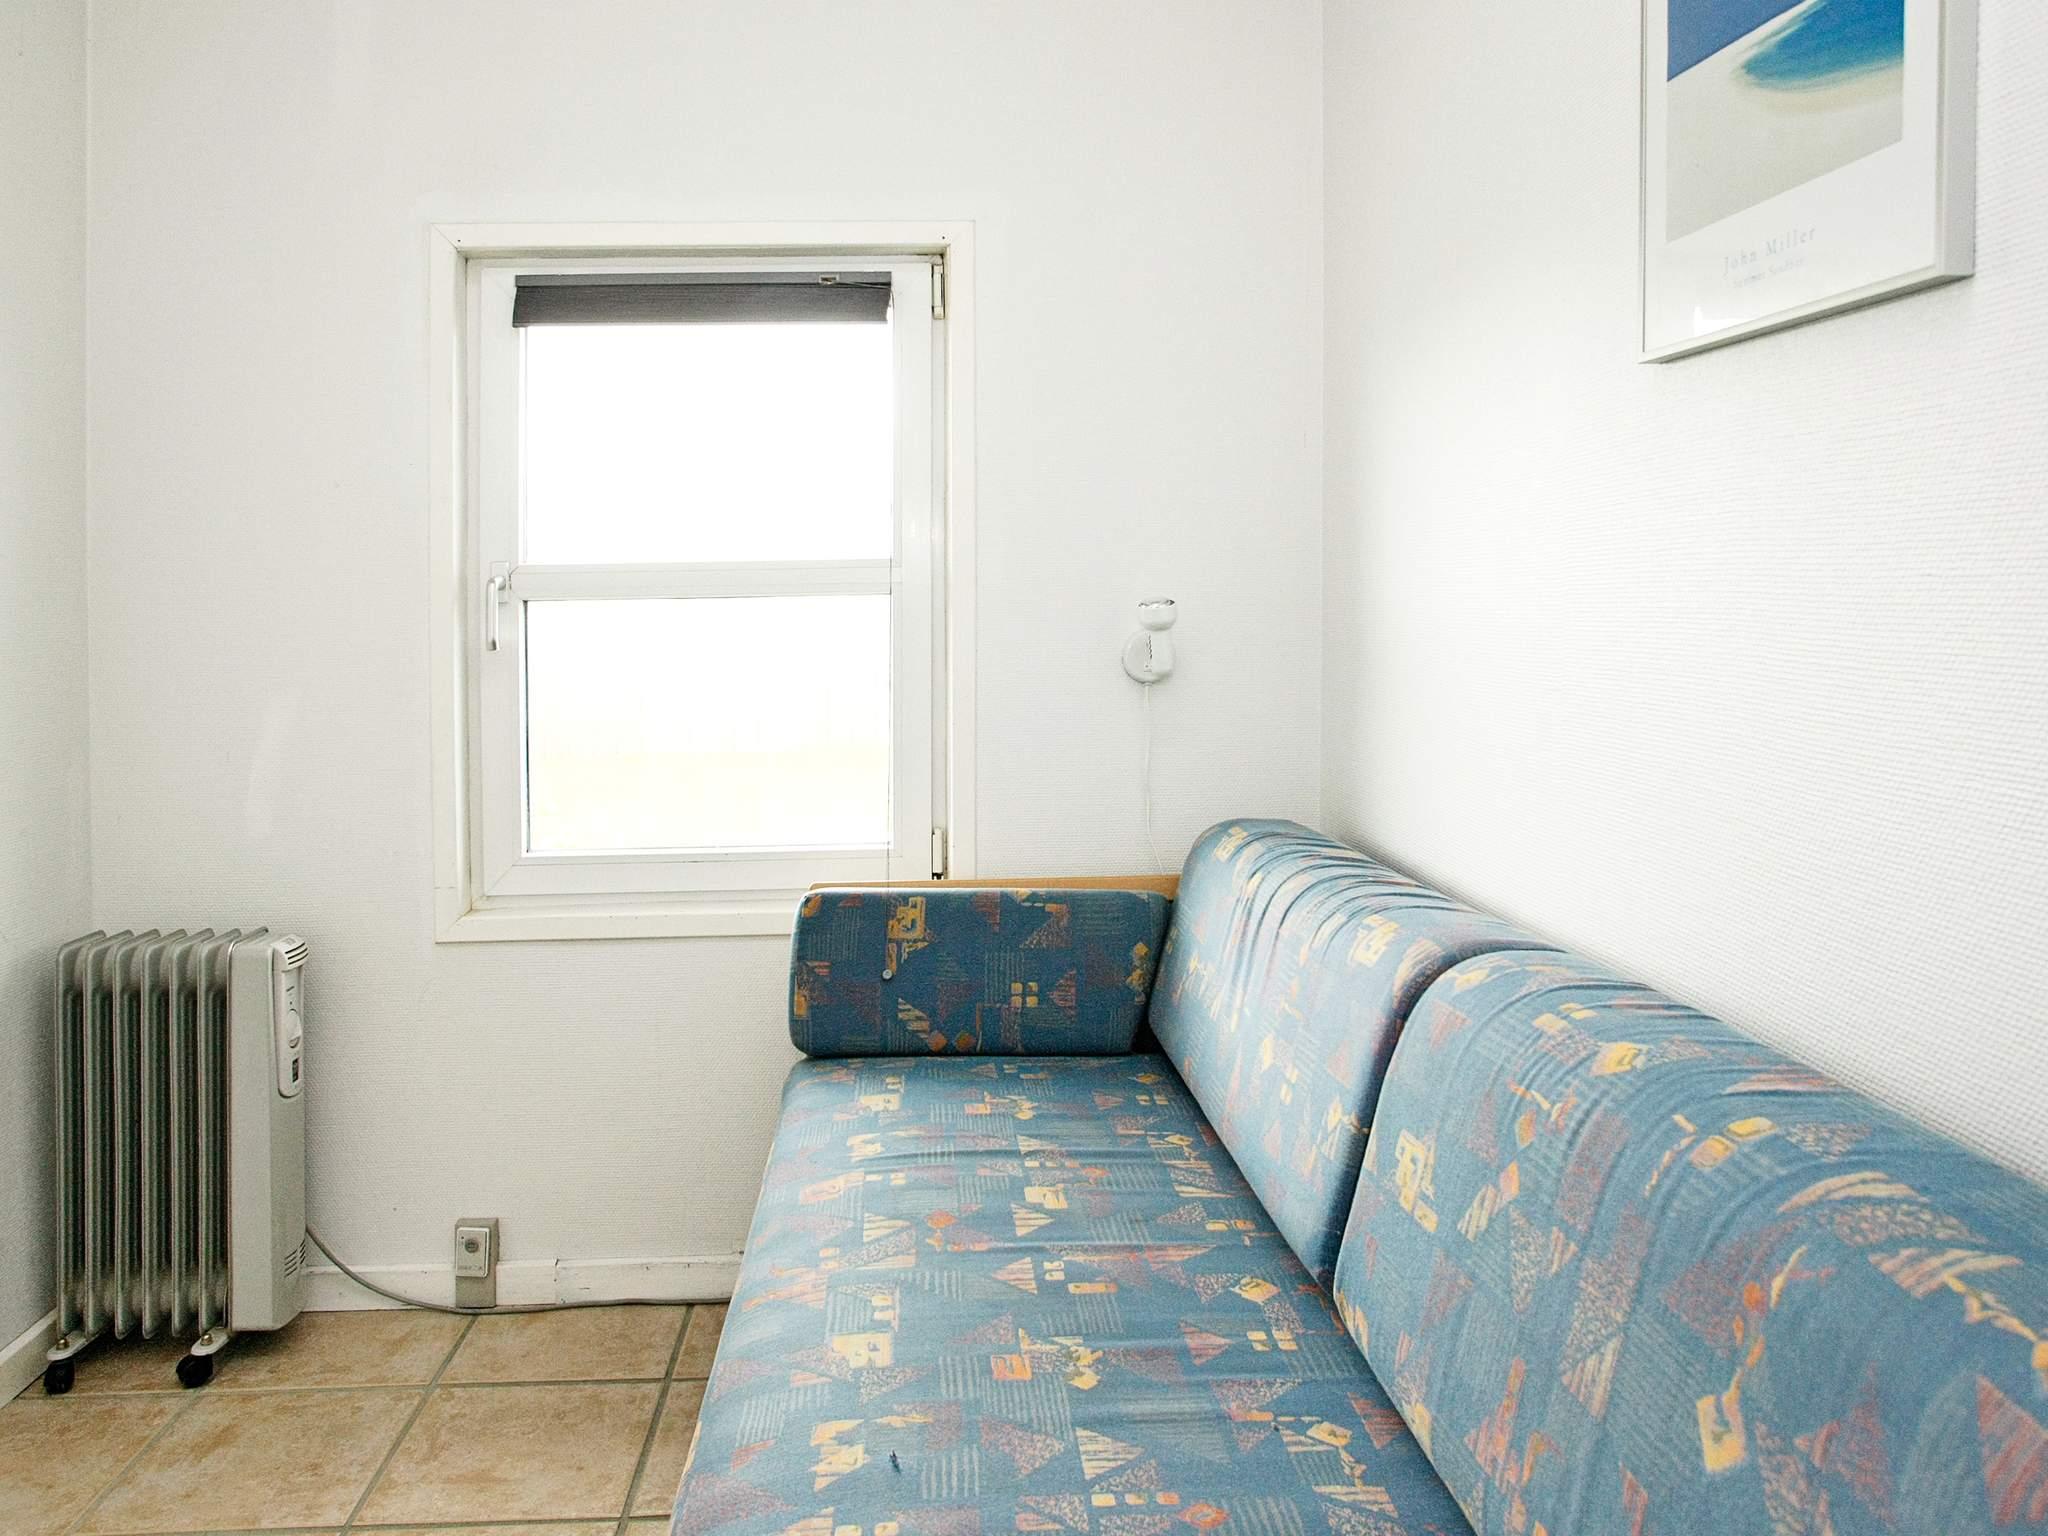 Ferienhaus Nr. Lyngby (89445), Løkken, , Nordwestjütland, Dänemark, Bild 6